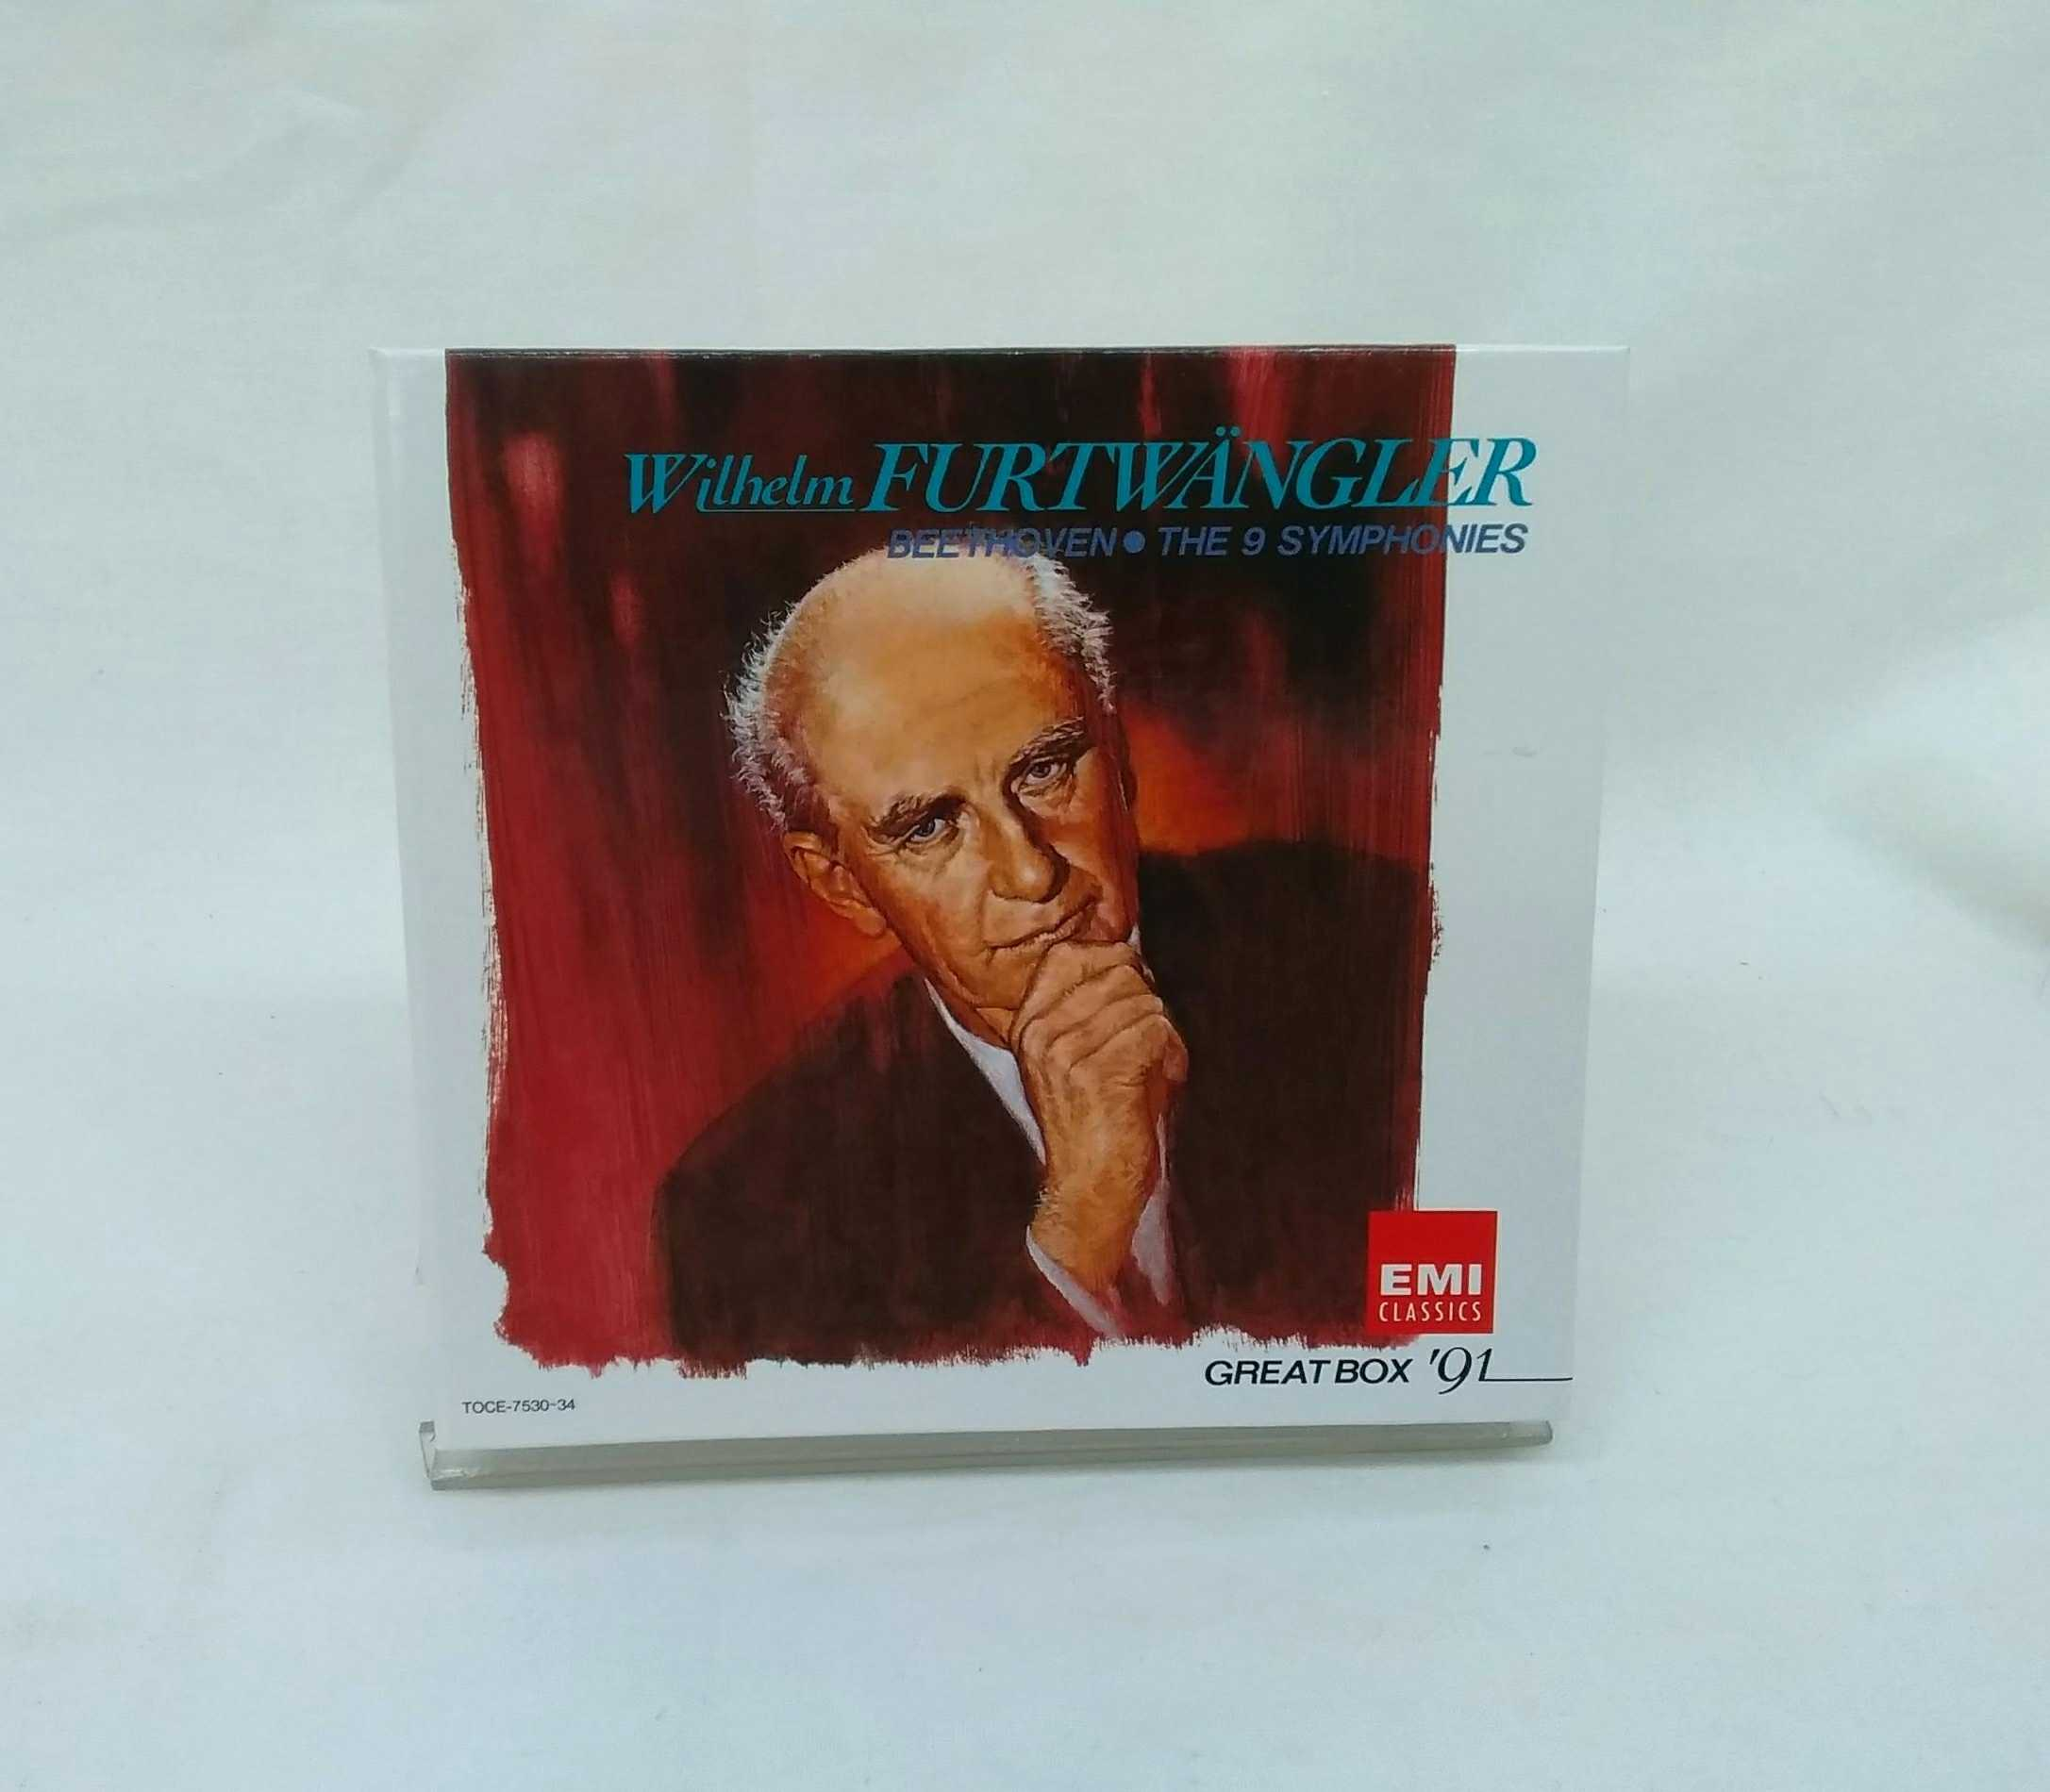 classic ベートーヴェン:交響曲全集 フルトヴェングラ|東芝EMI